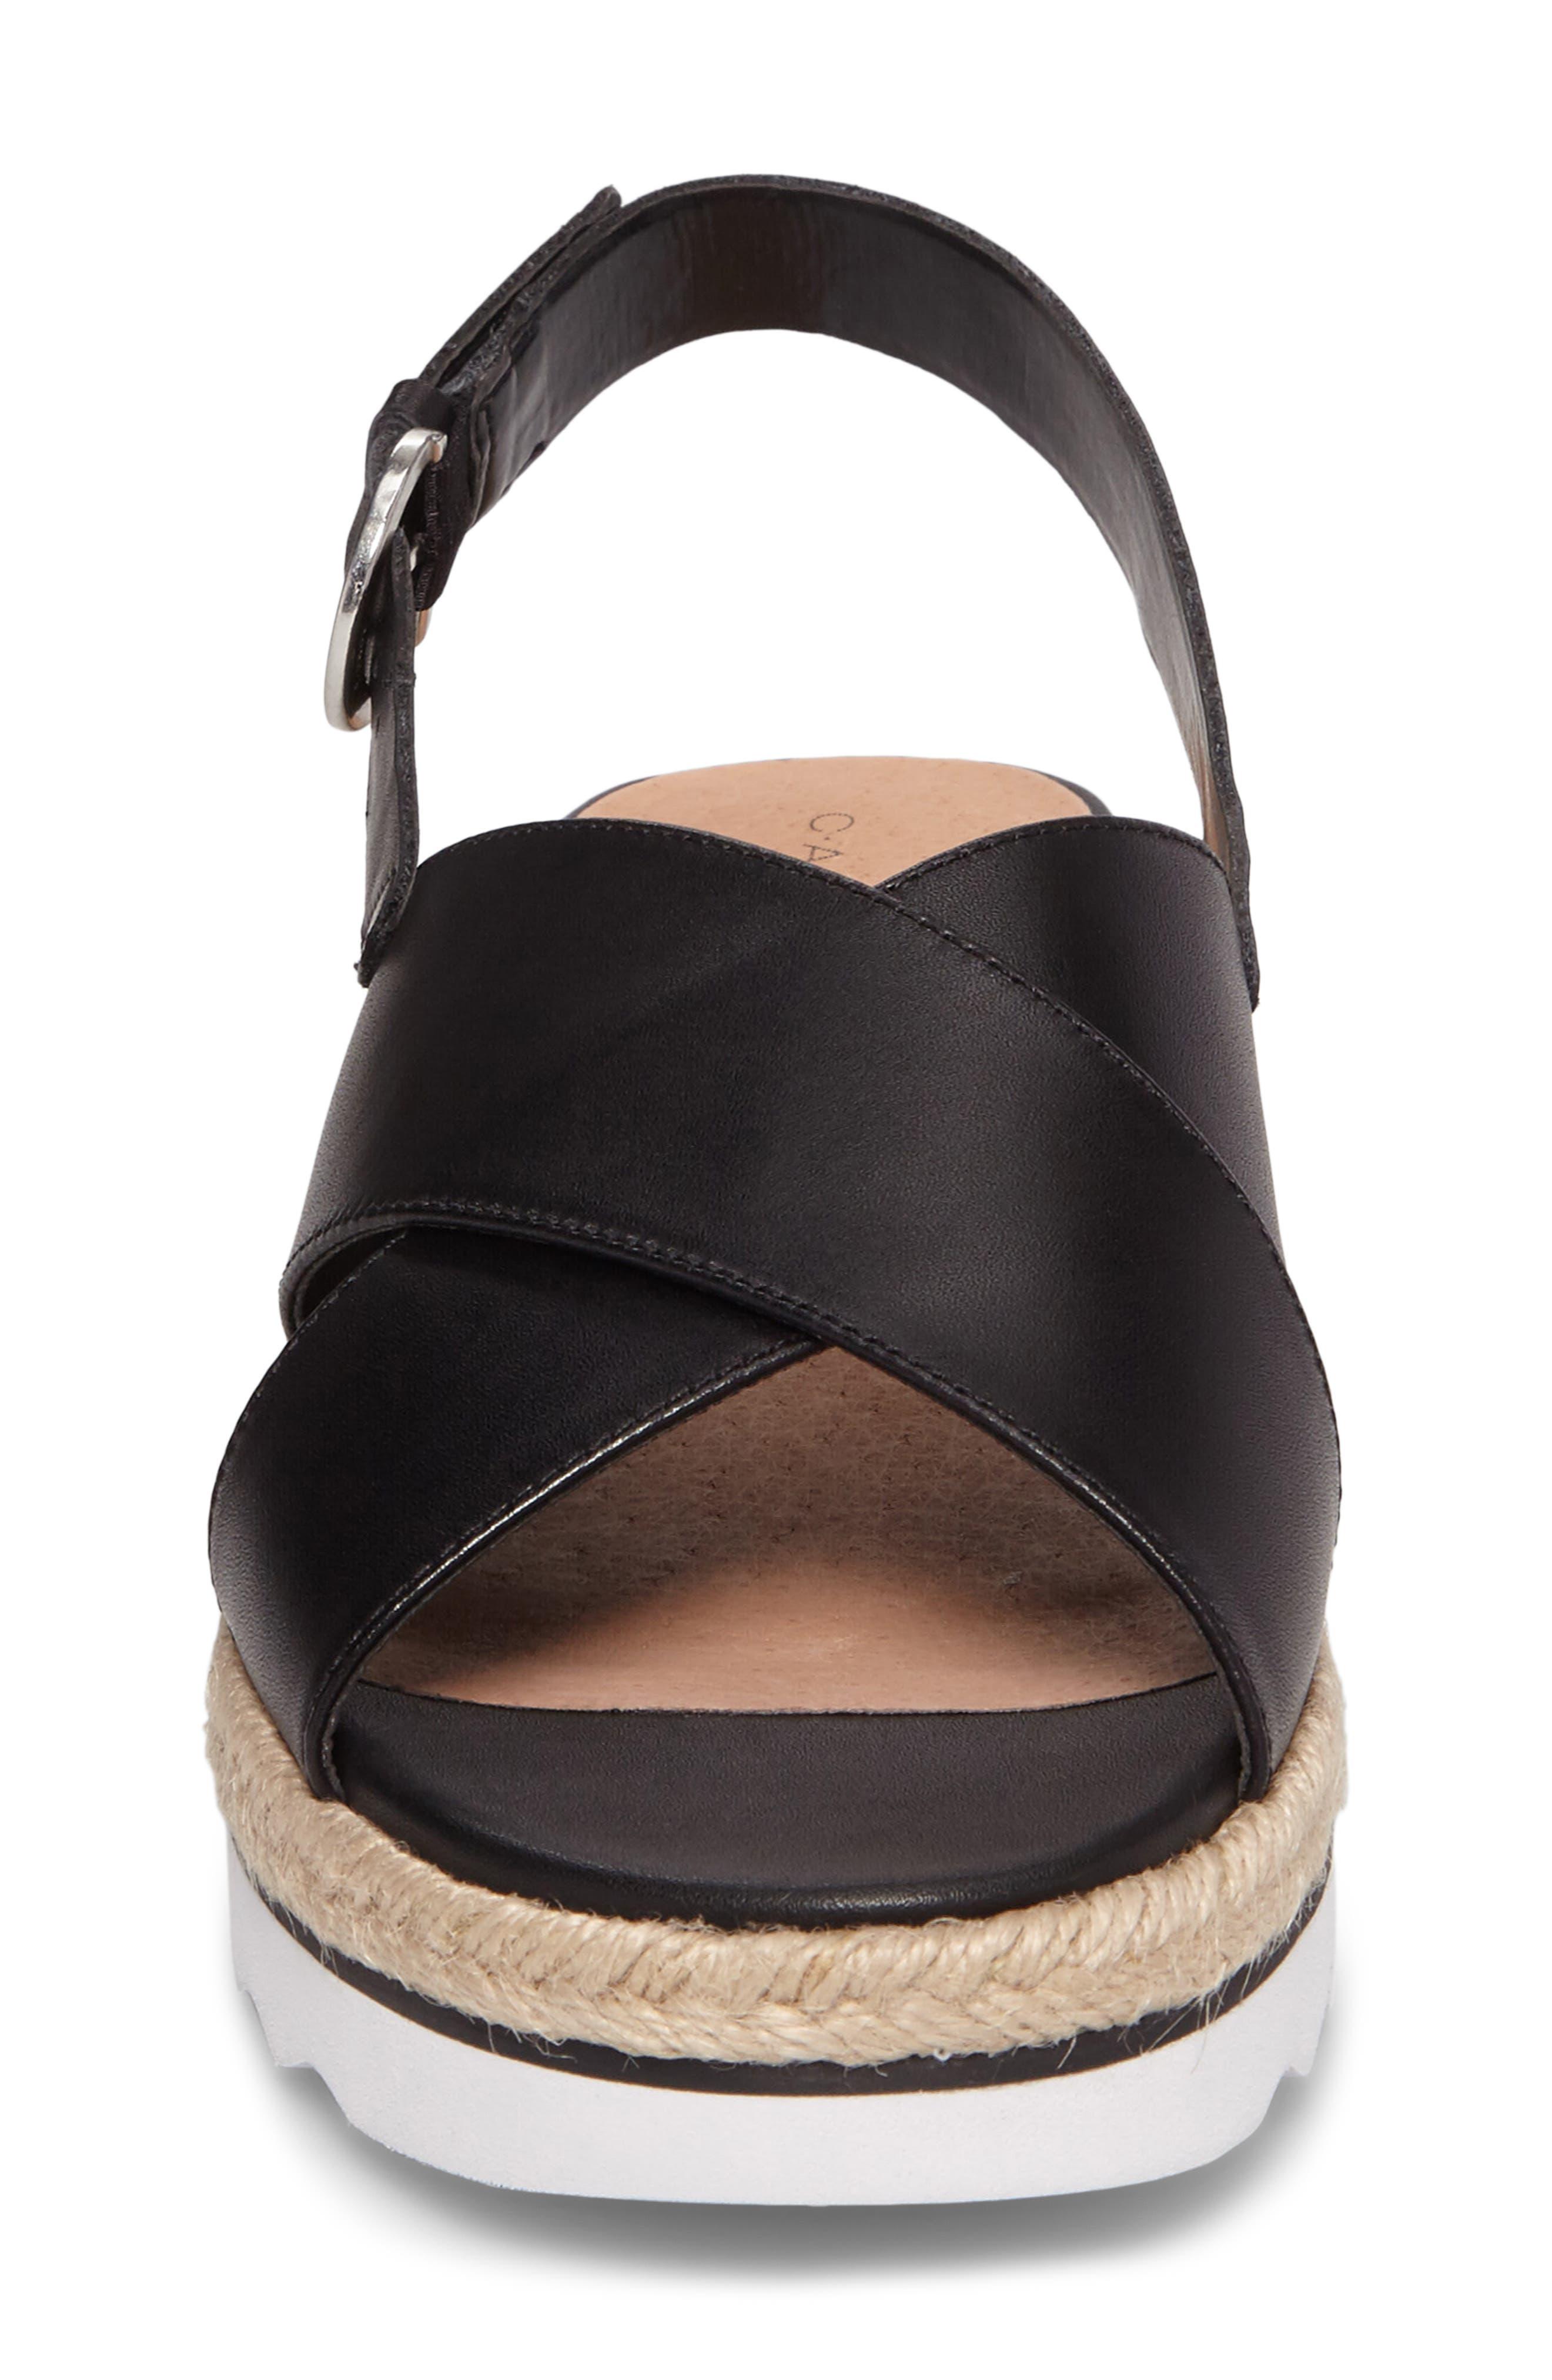 Caslon Lucas Slingback Sandal,                             Alternate thumbnail 5, color,                             Black Leather